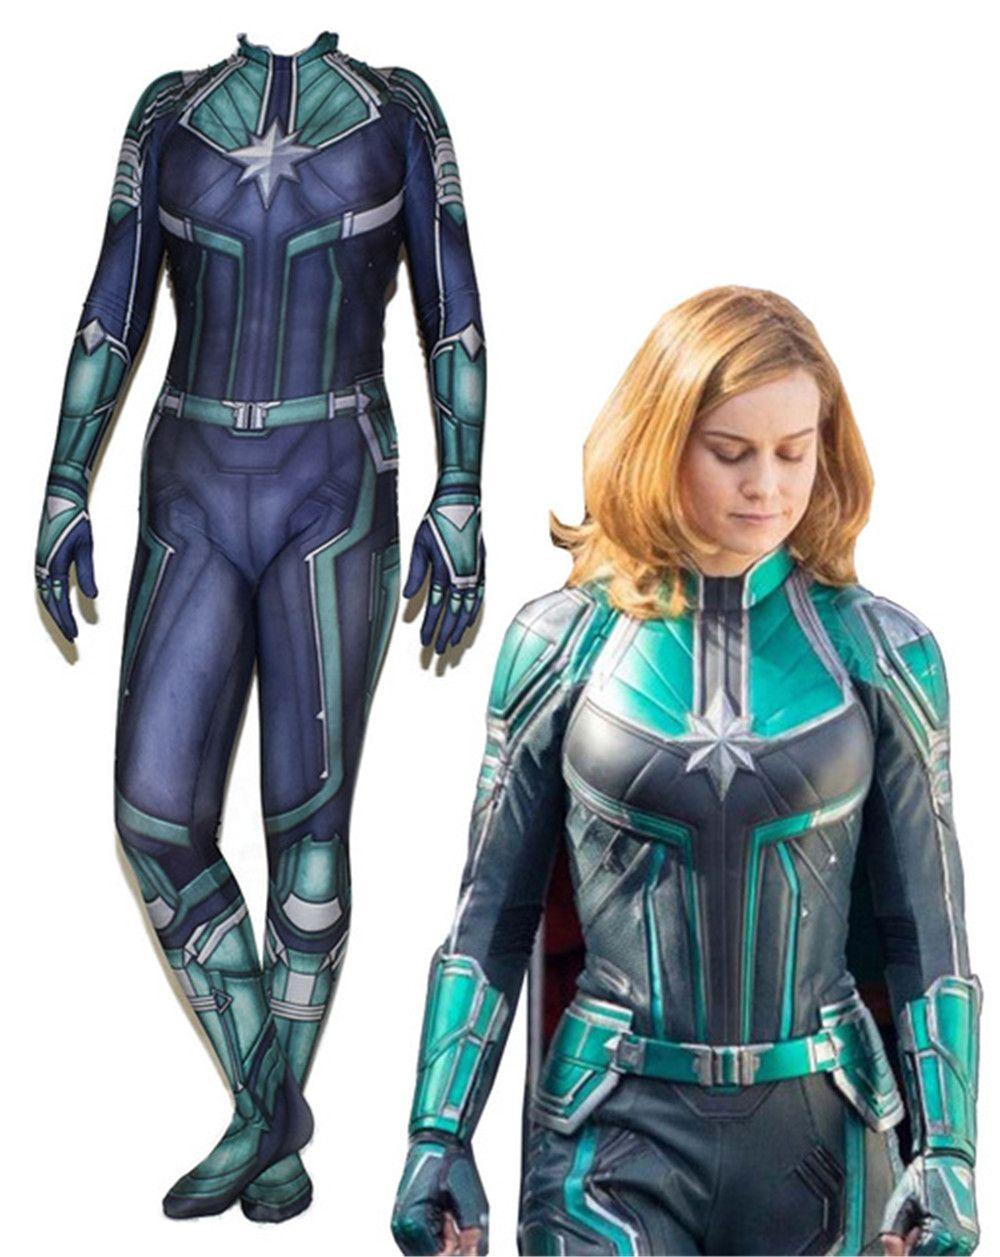 avengers woman captain marvel ms marvel carol danvers cosplay